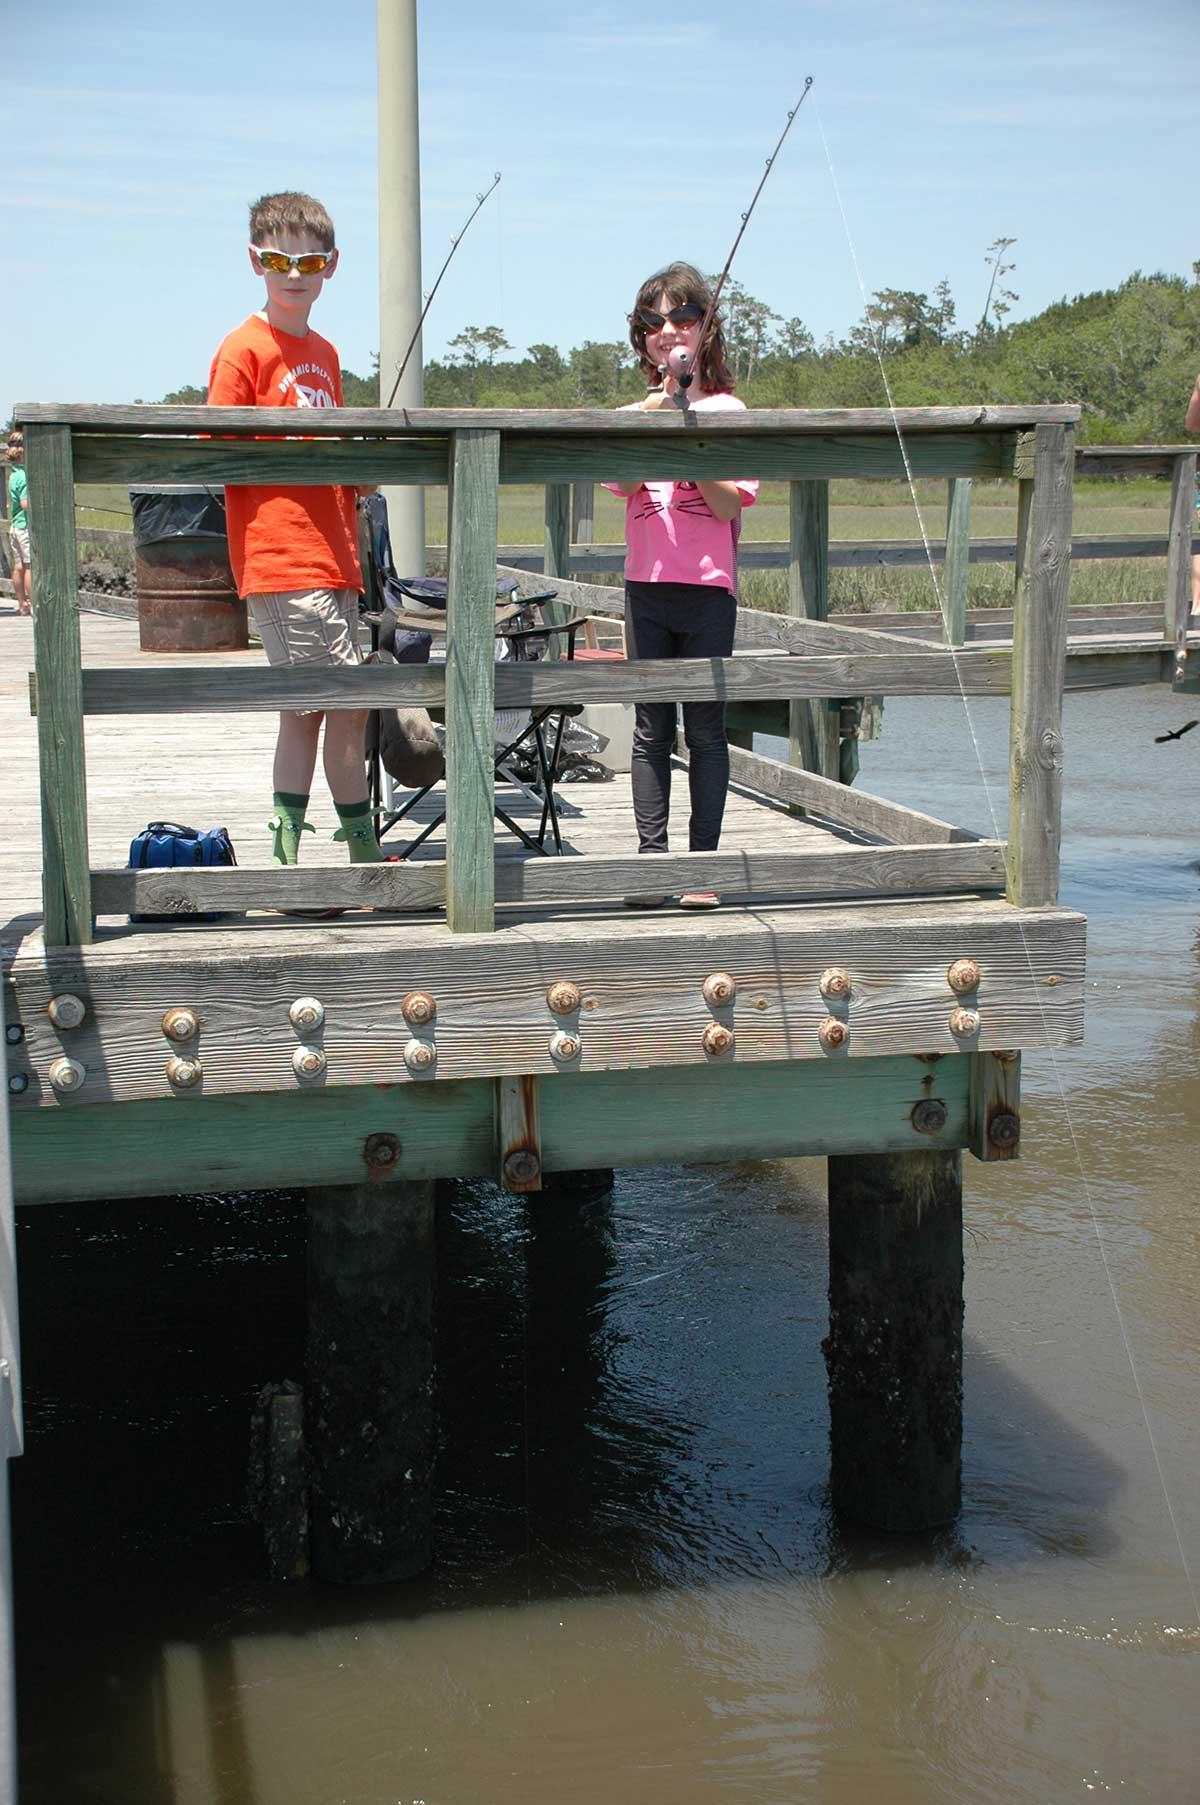 Children fishing off of a public dock.